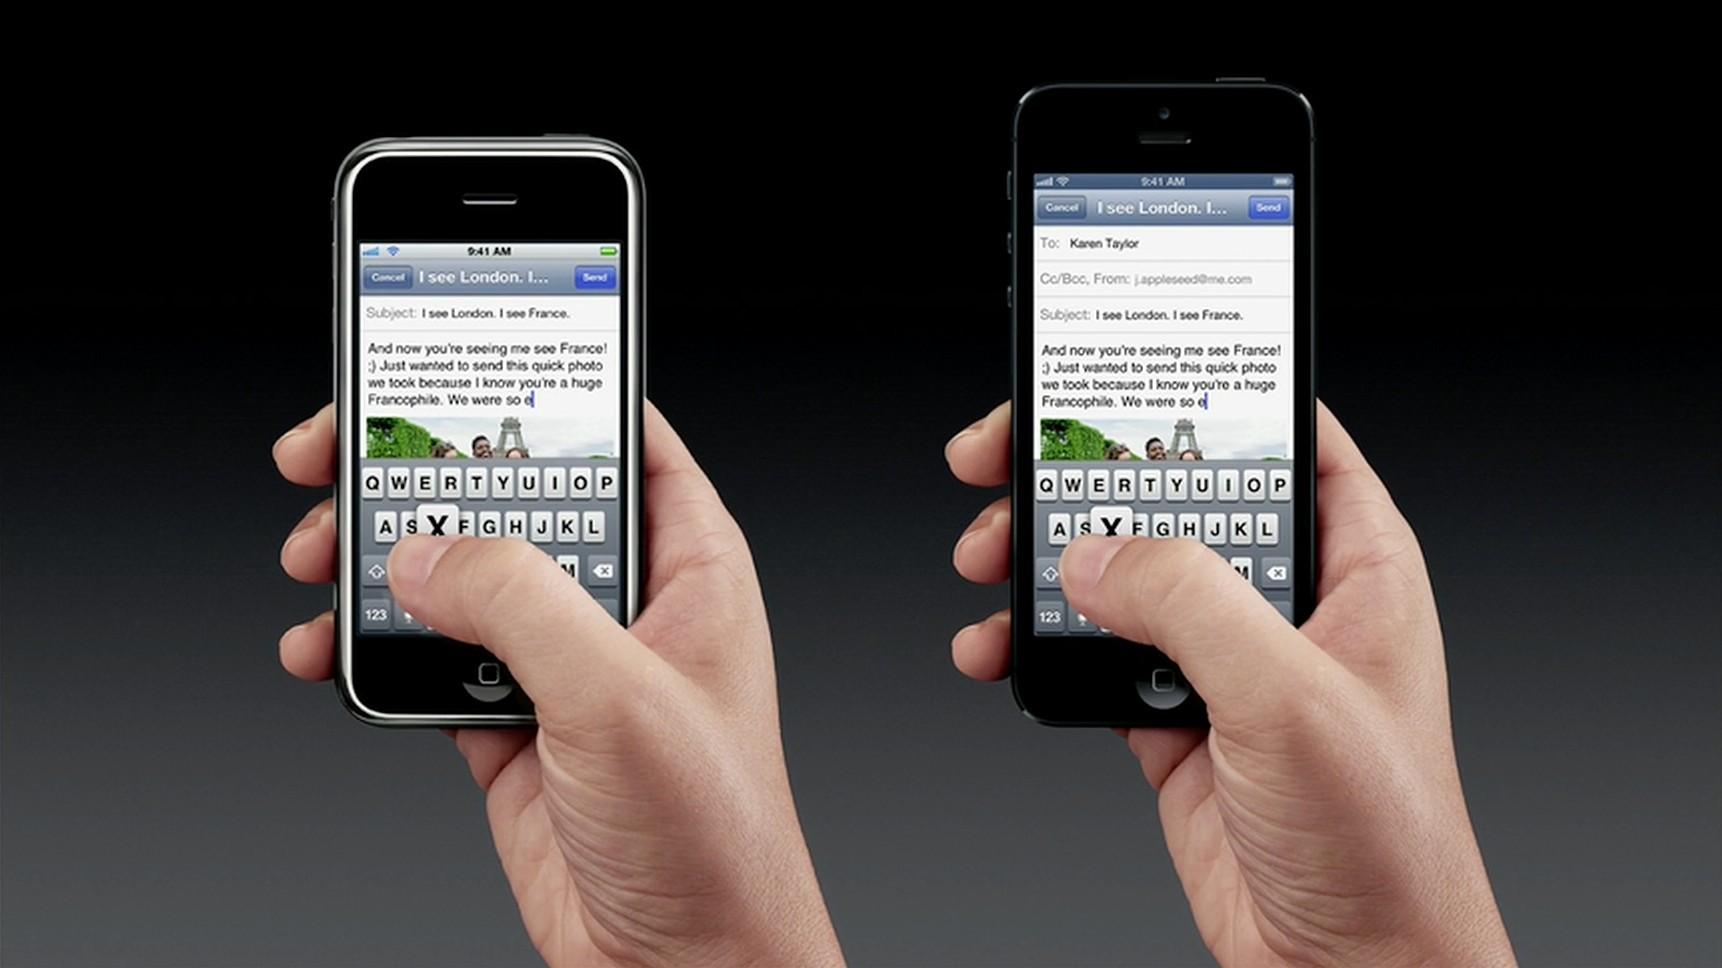 iPhone 5 Thumbs